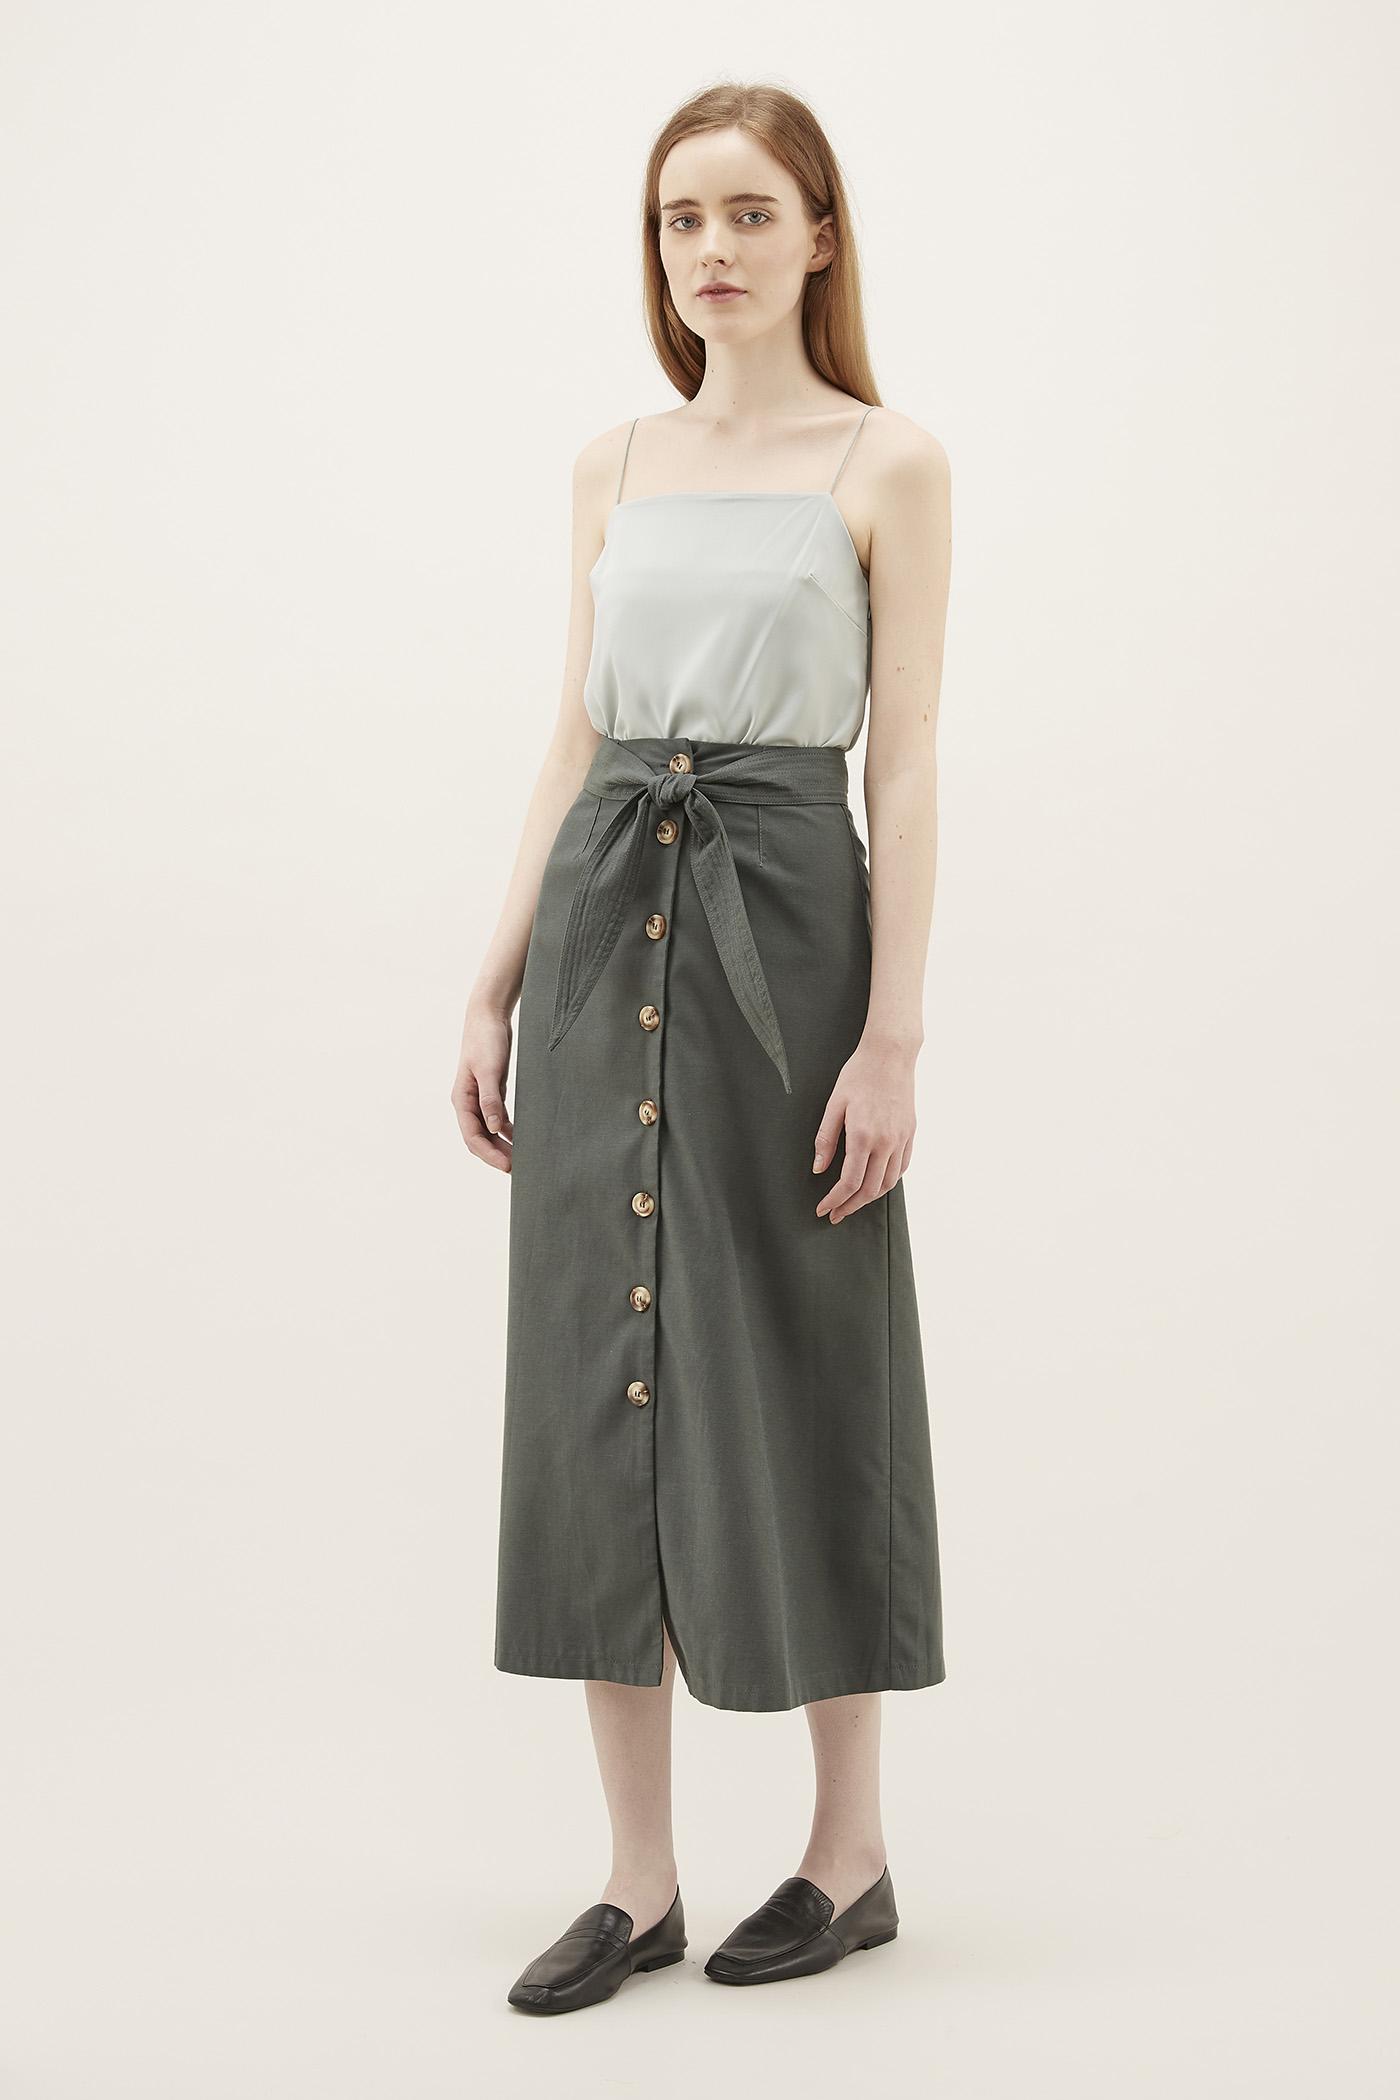 Cheyanne Belted Midi Skirt